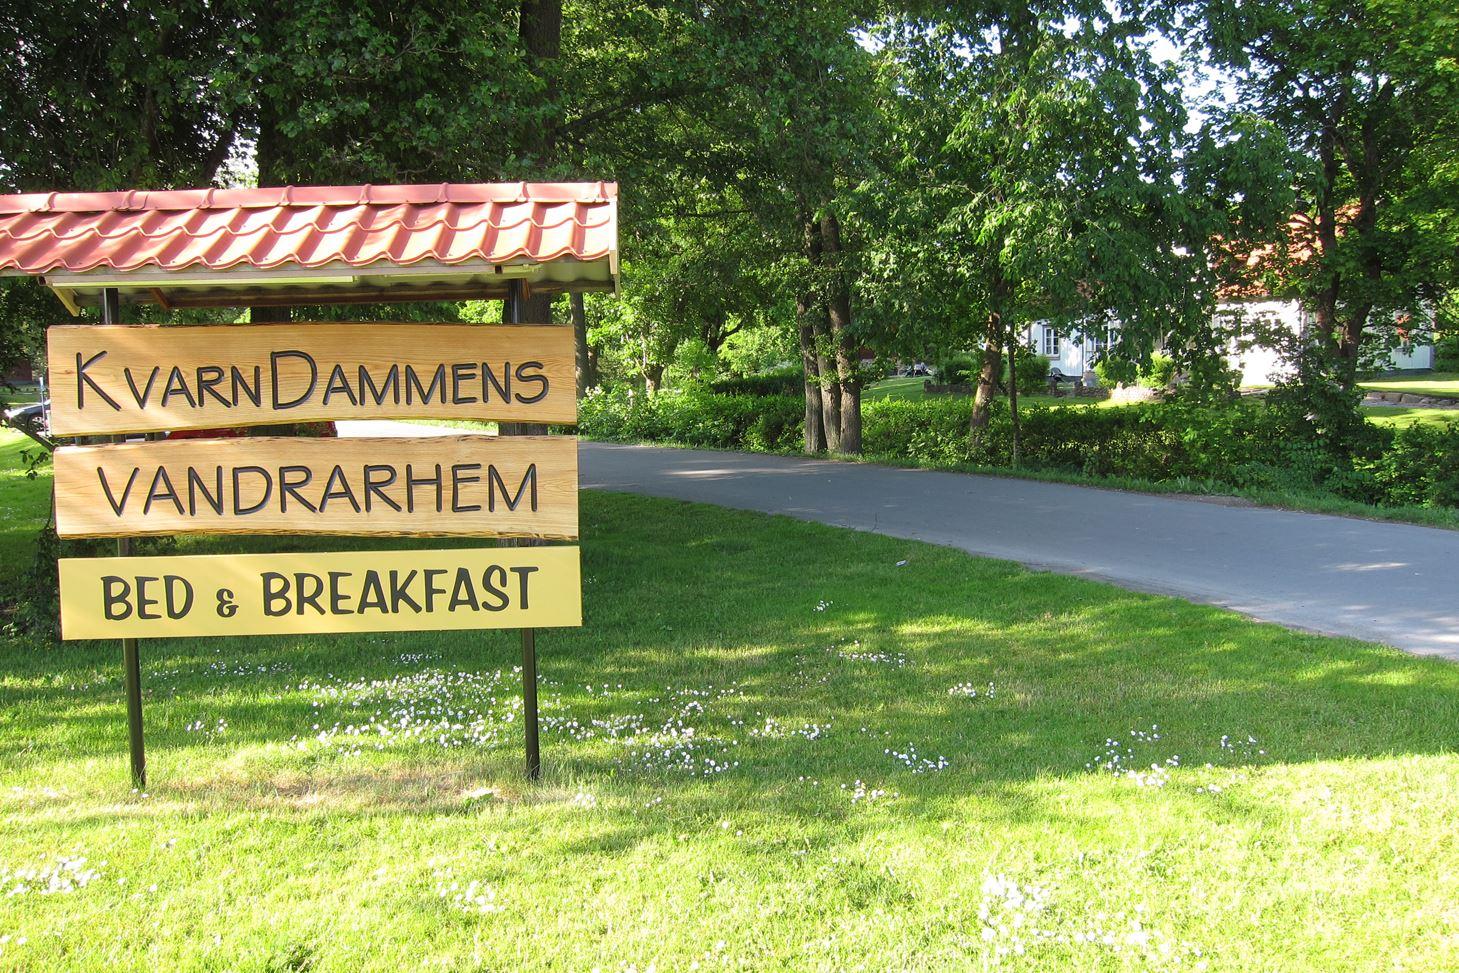 © Kvarndammens Vandrarhem, Kvarndammens Vandrarhem / Bed & Breakfast